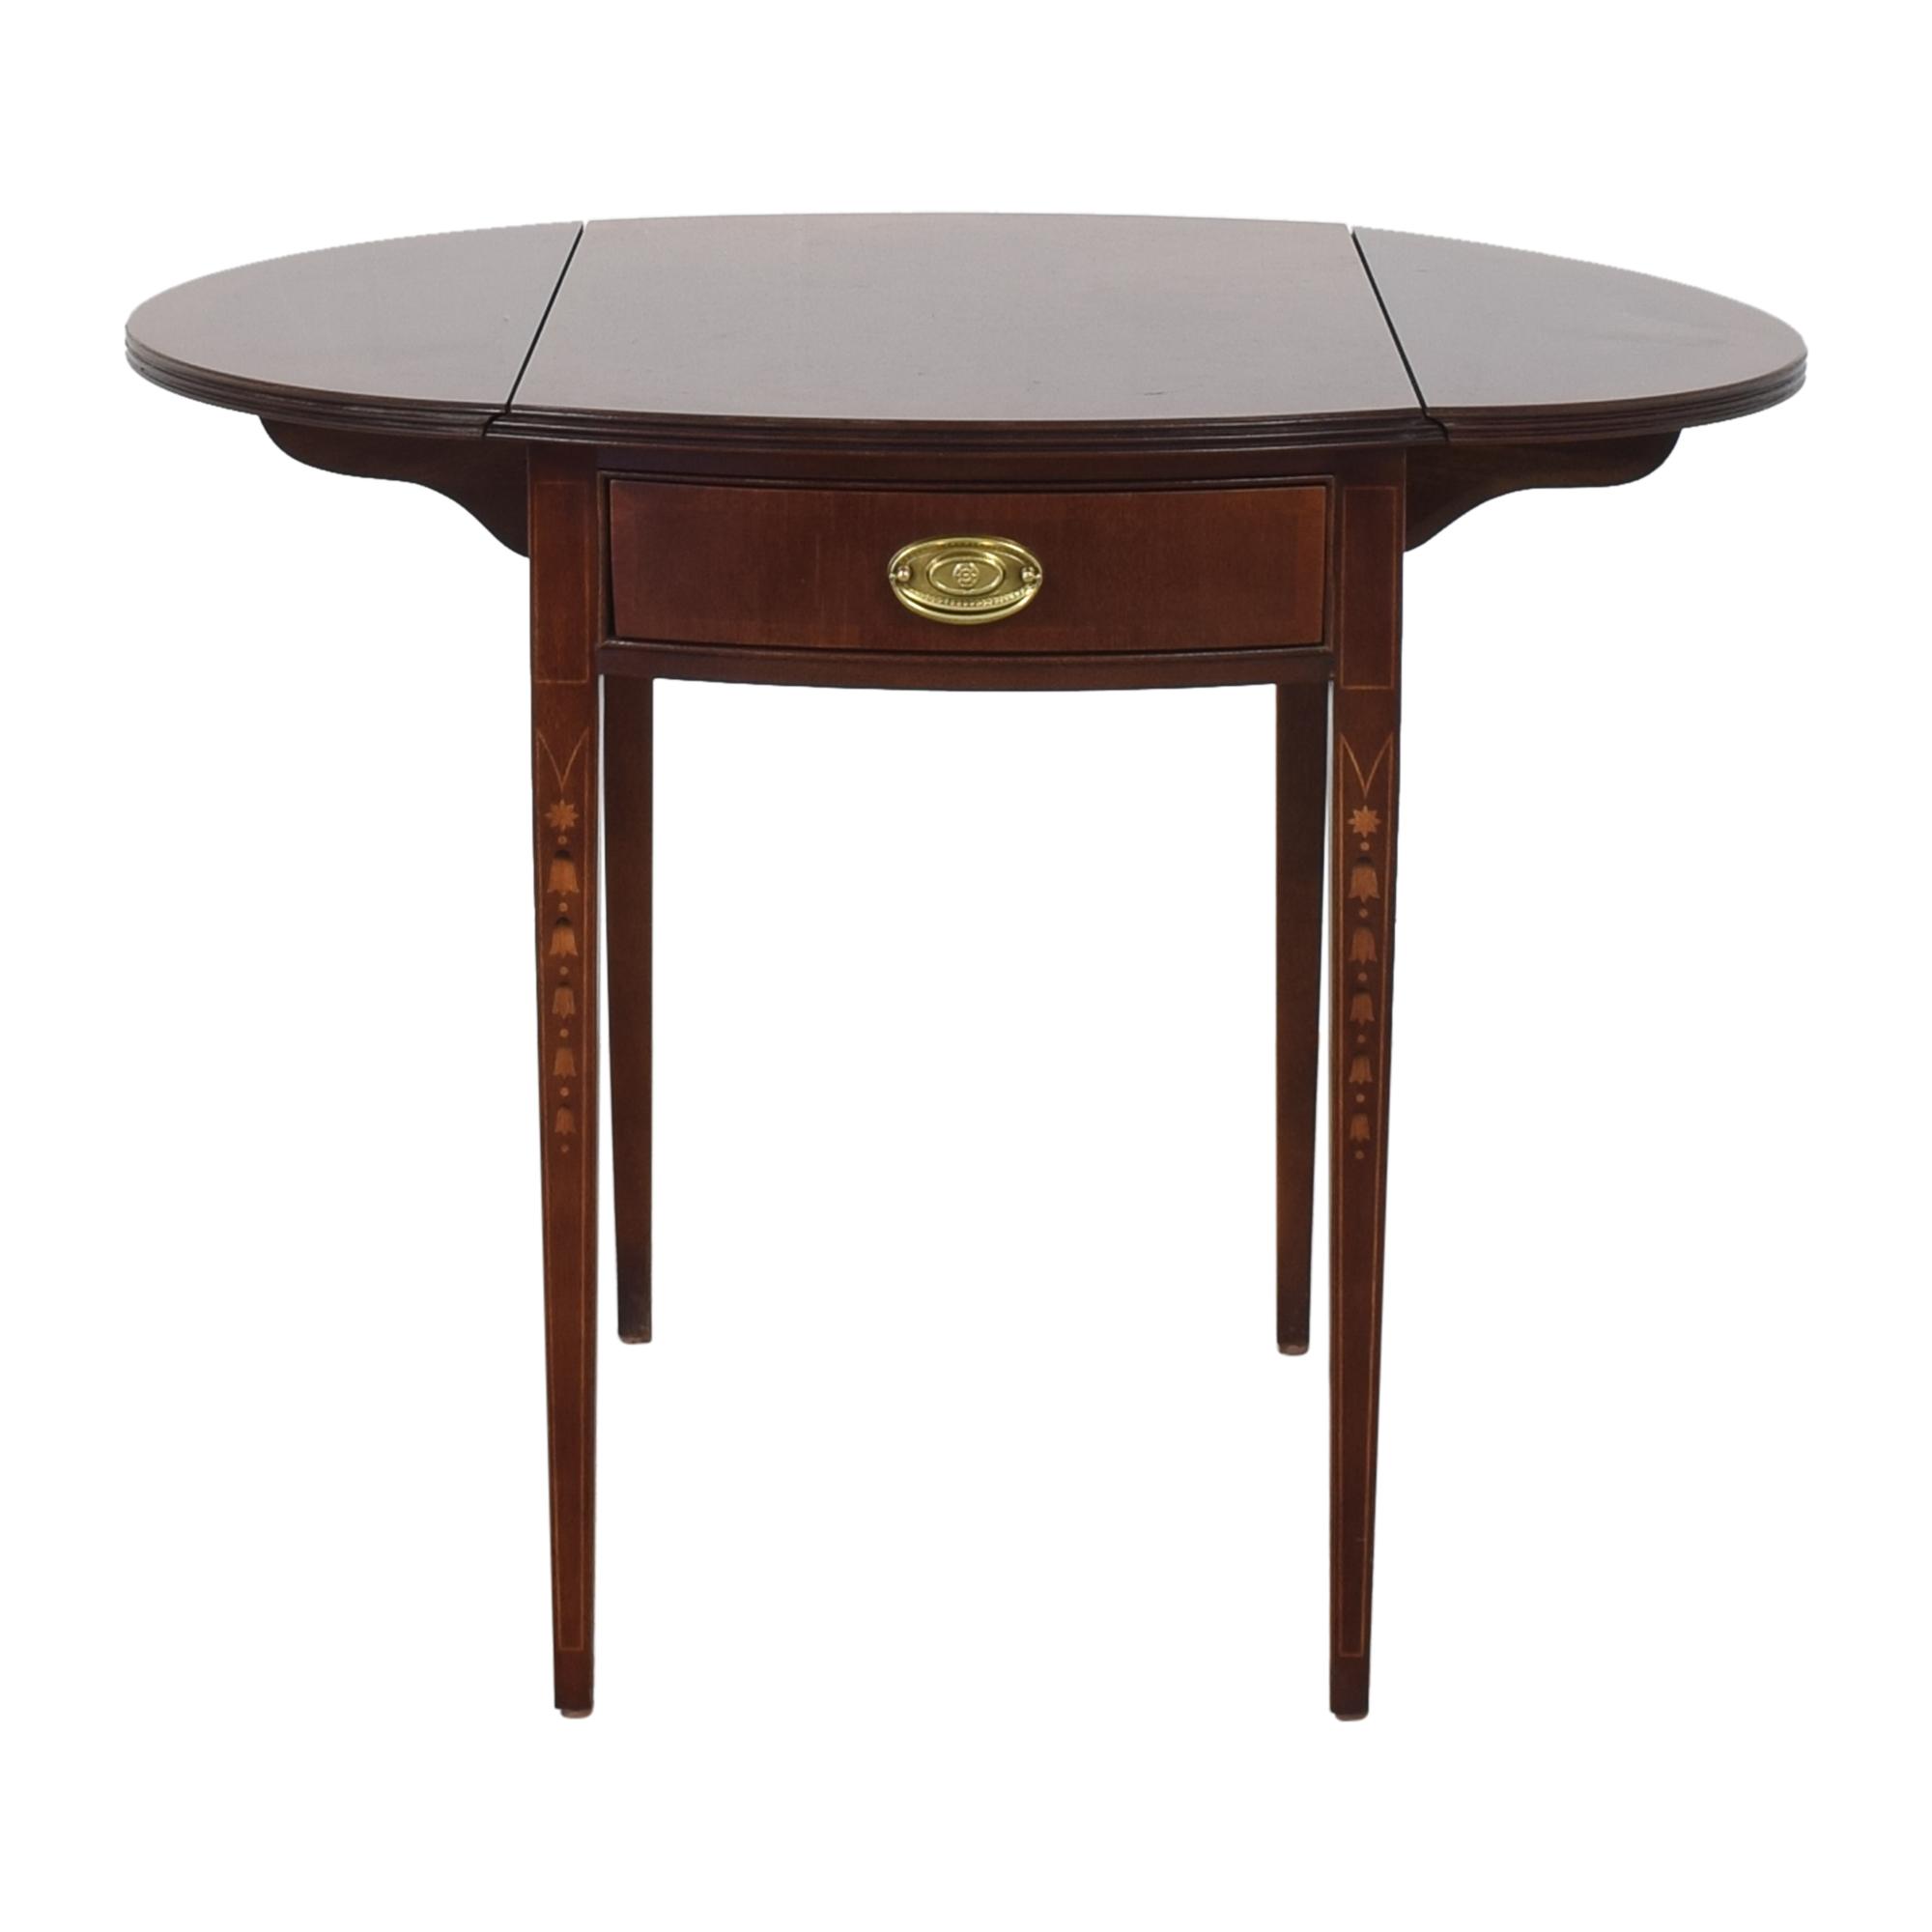 Ethan Allen Ethan Allen 18th Century Collection Pembroke End Table End Tables